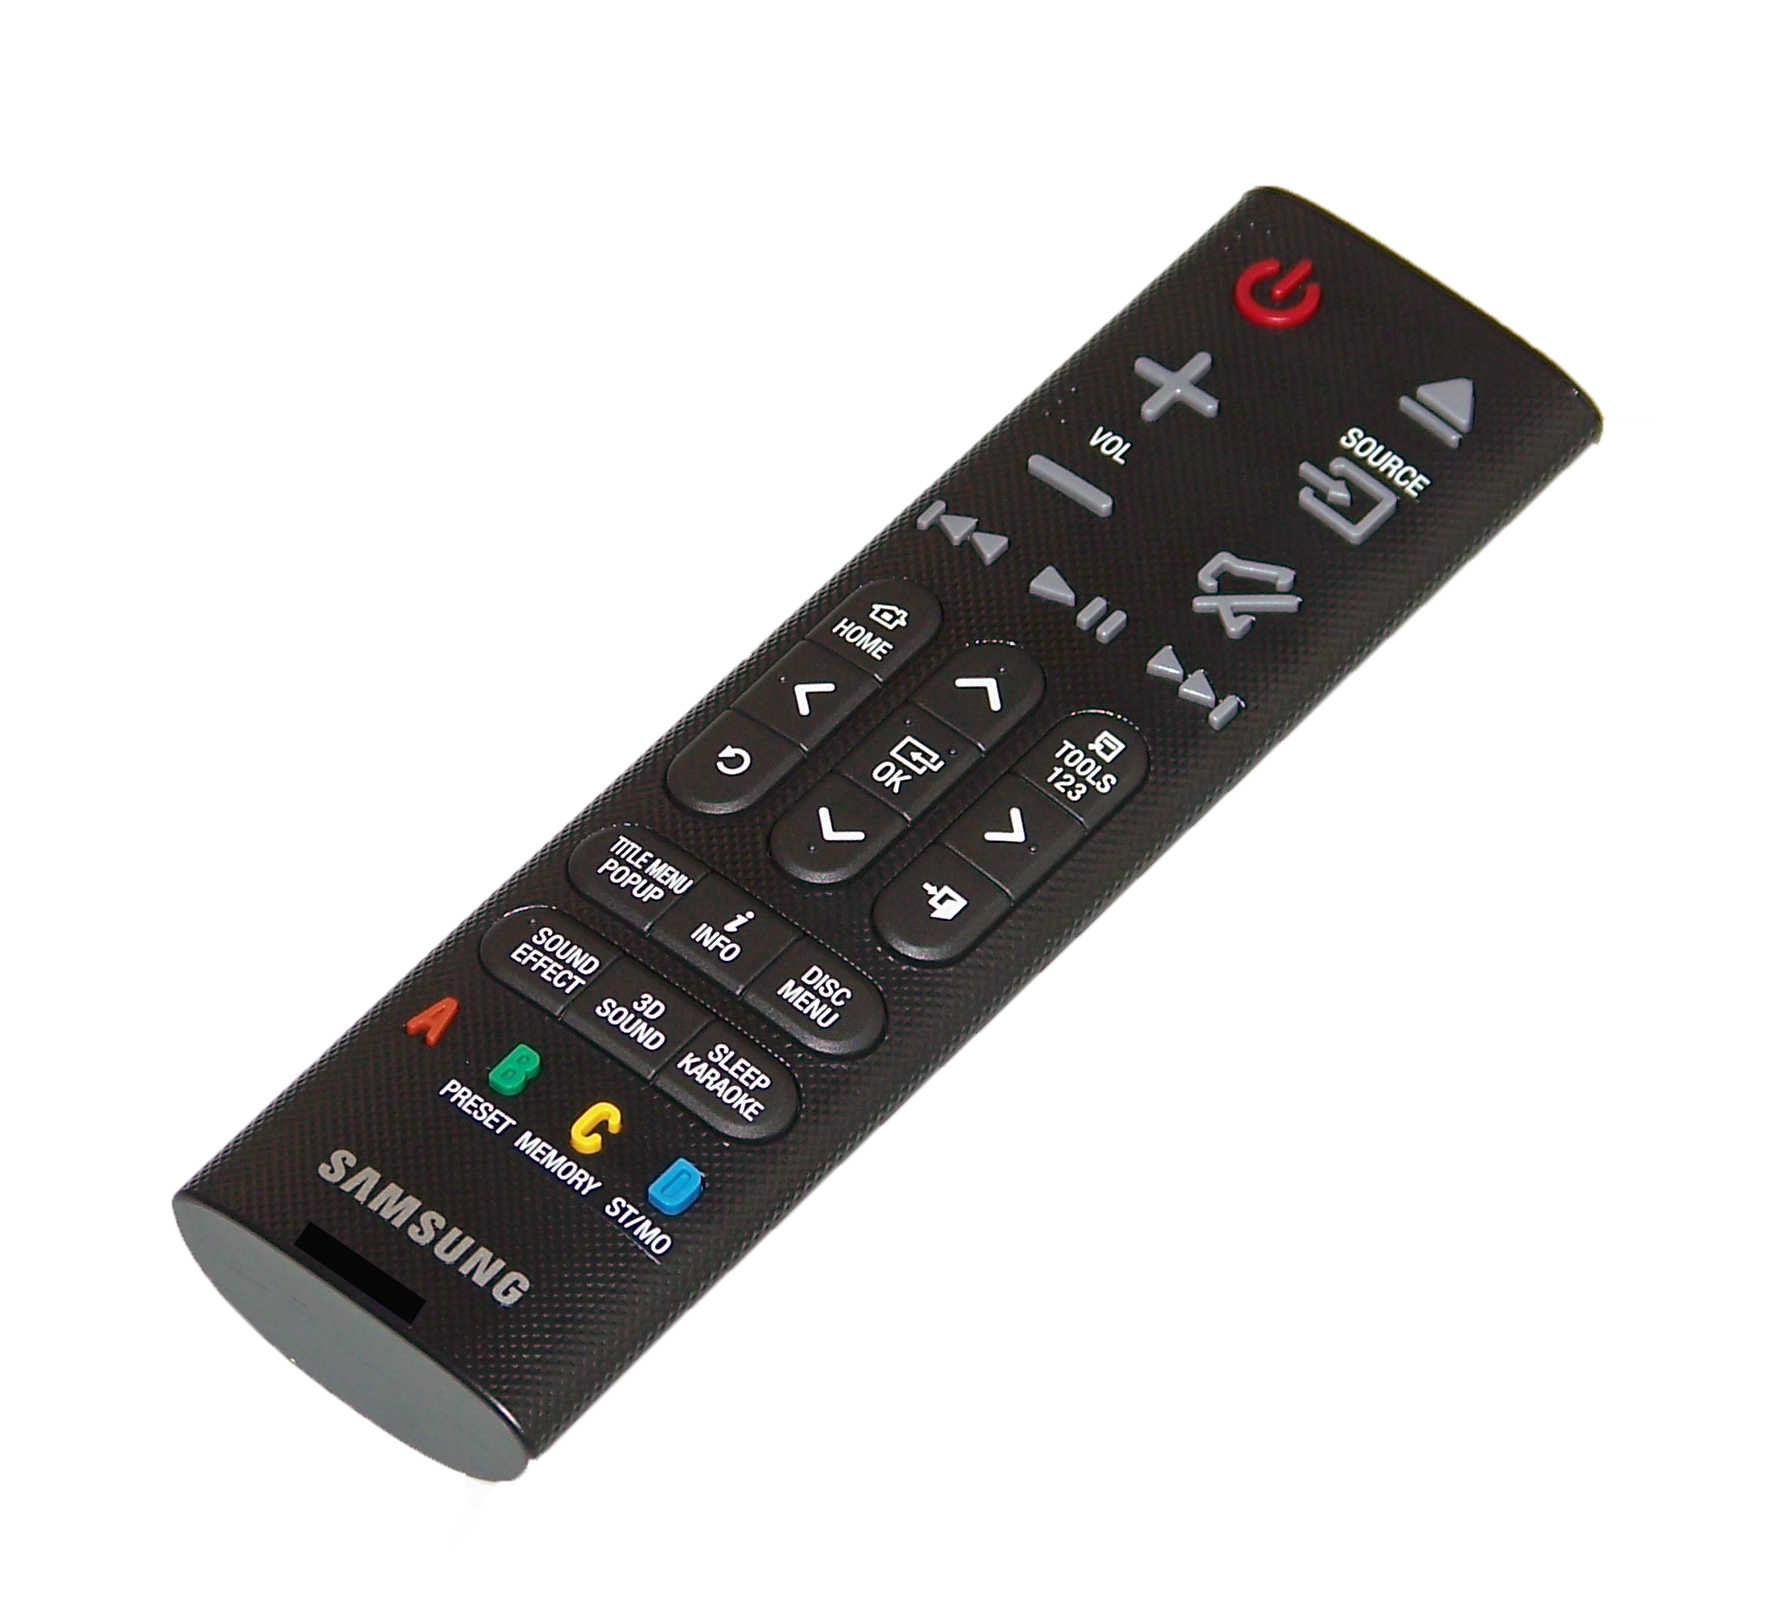 OEM Samsung Remote Control: HTH7730WM/ZA, HT-H7730WM/ZA